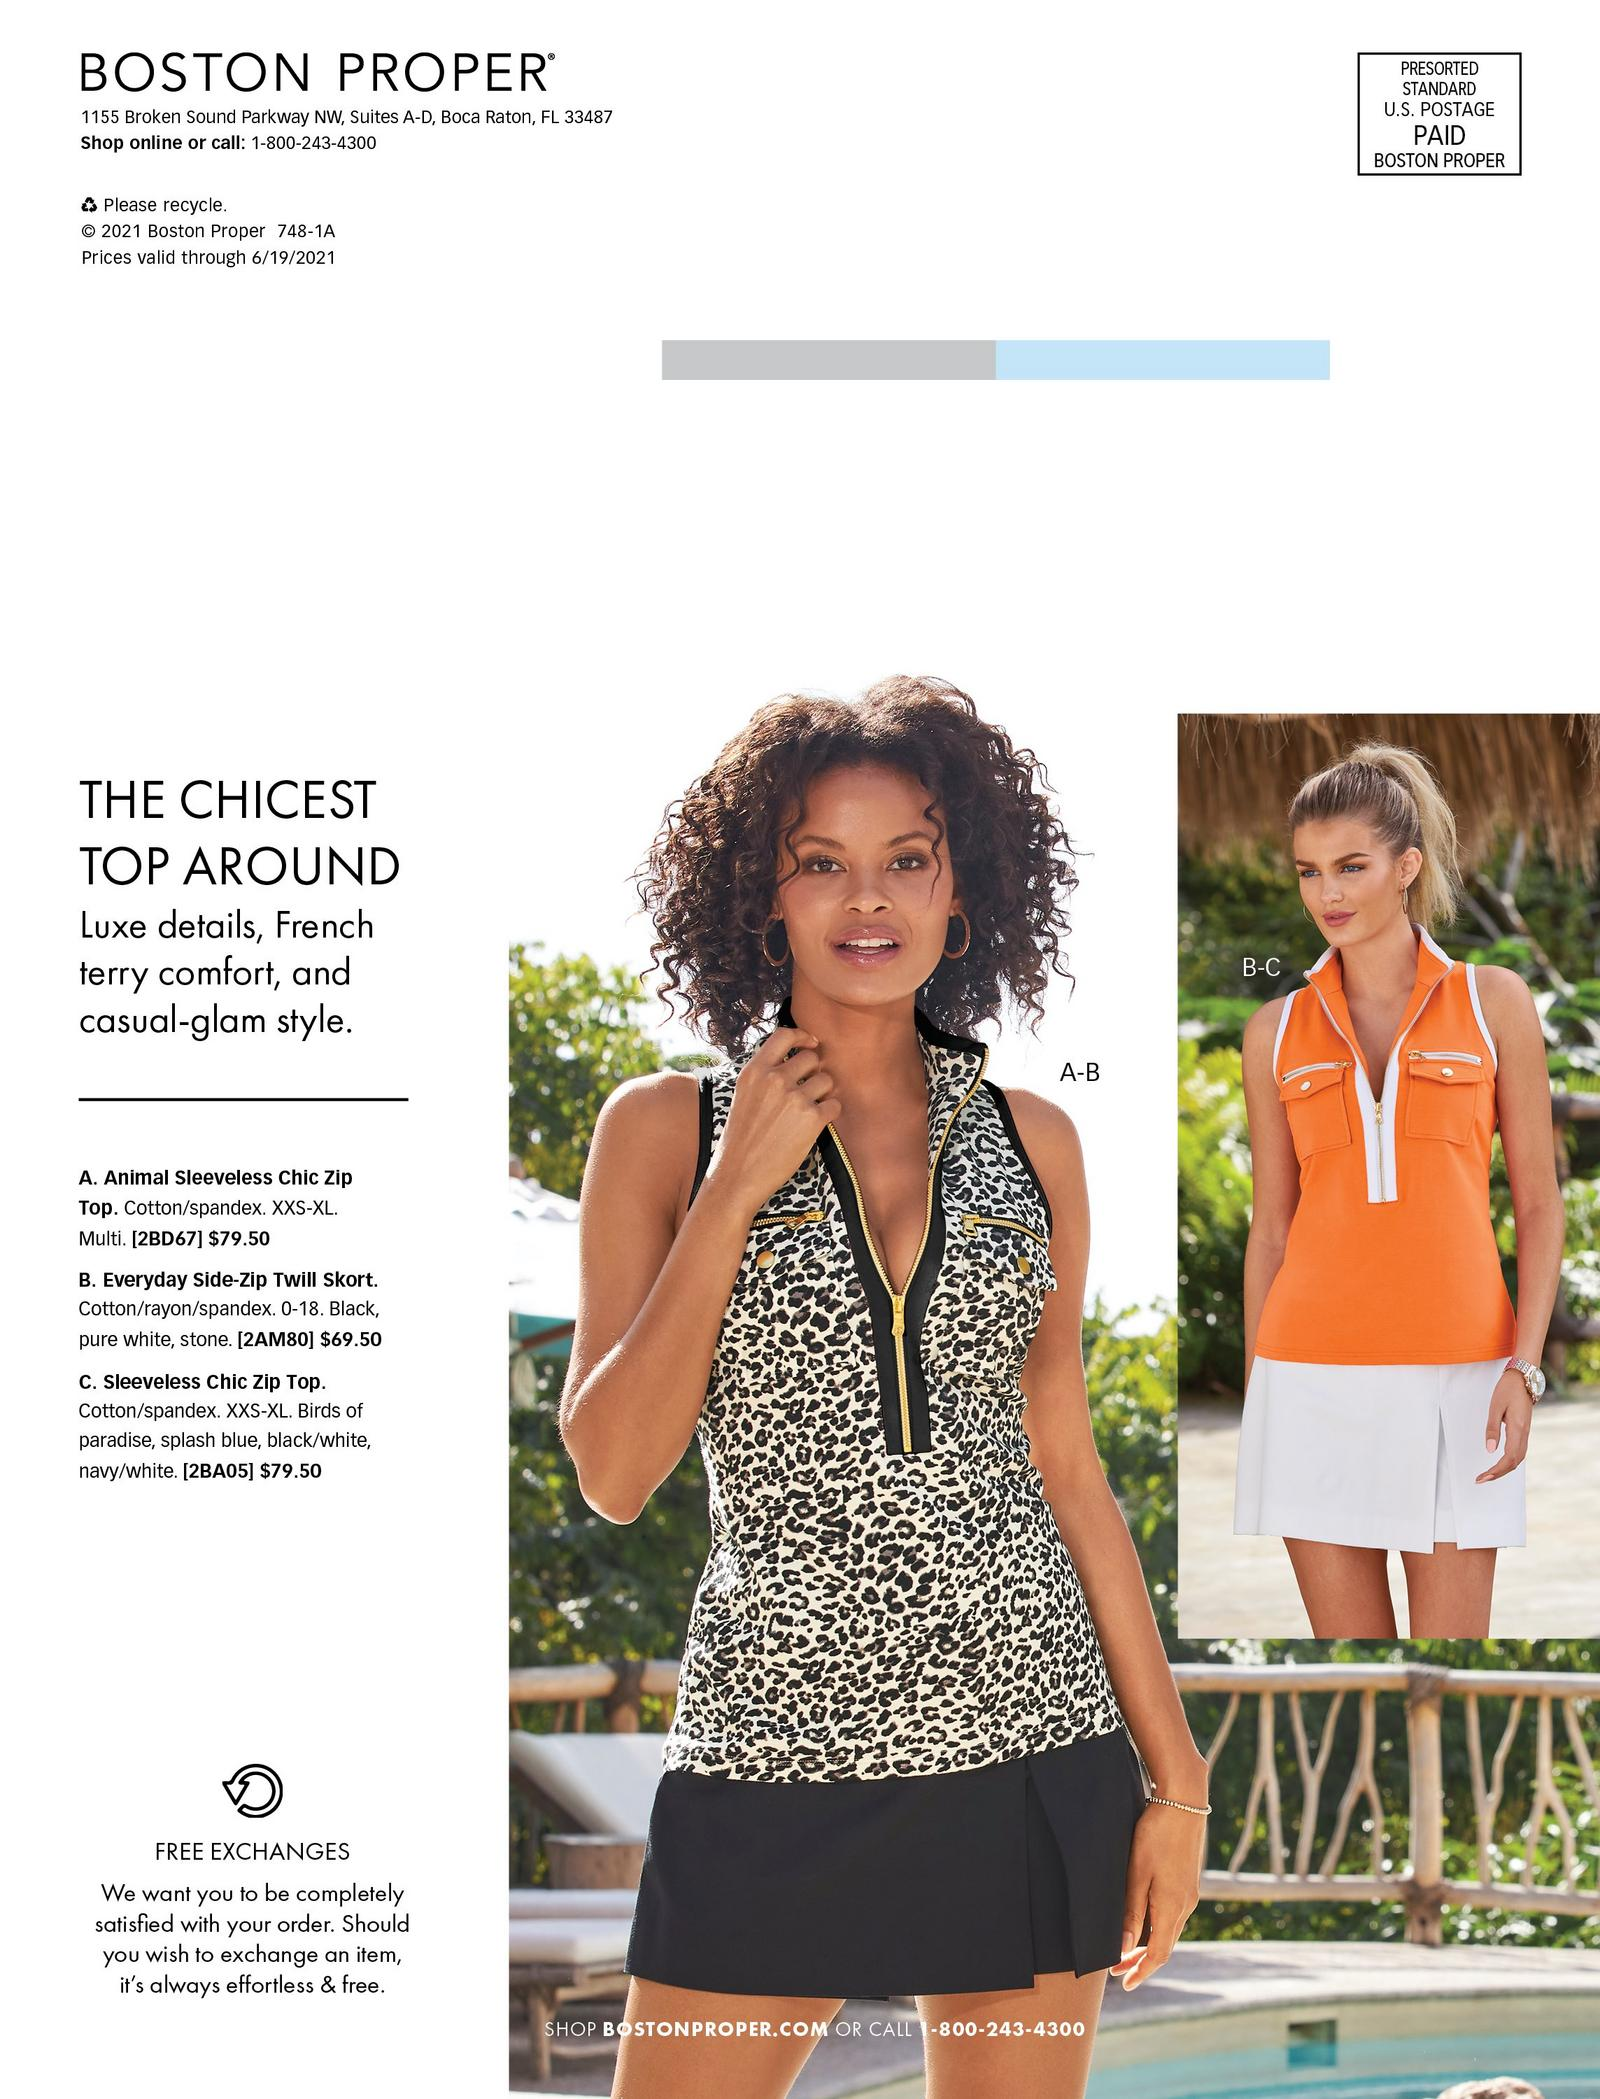 left model wearing a leopard print sleeveless quarter zip sport top and black skort. right model wearing an orange sleeveless quarter zip sport top and white skort.